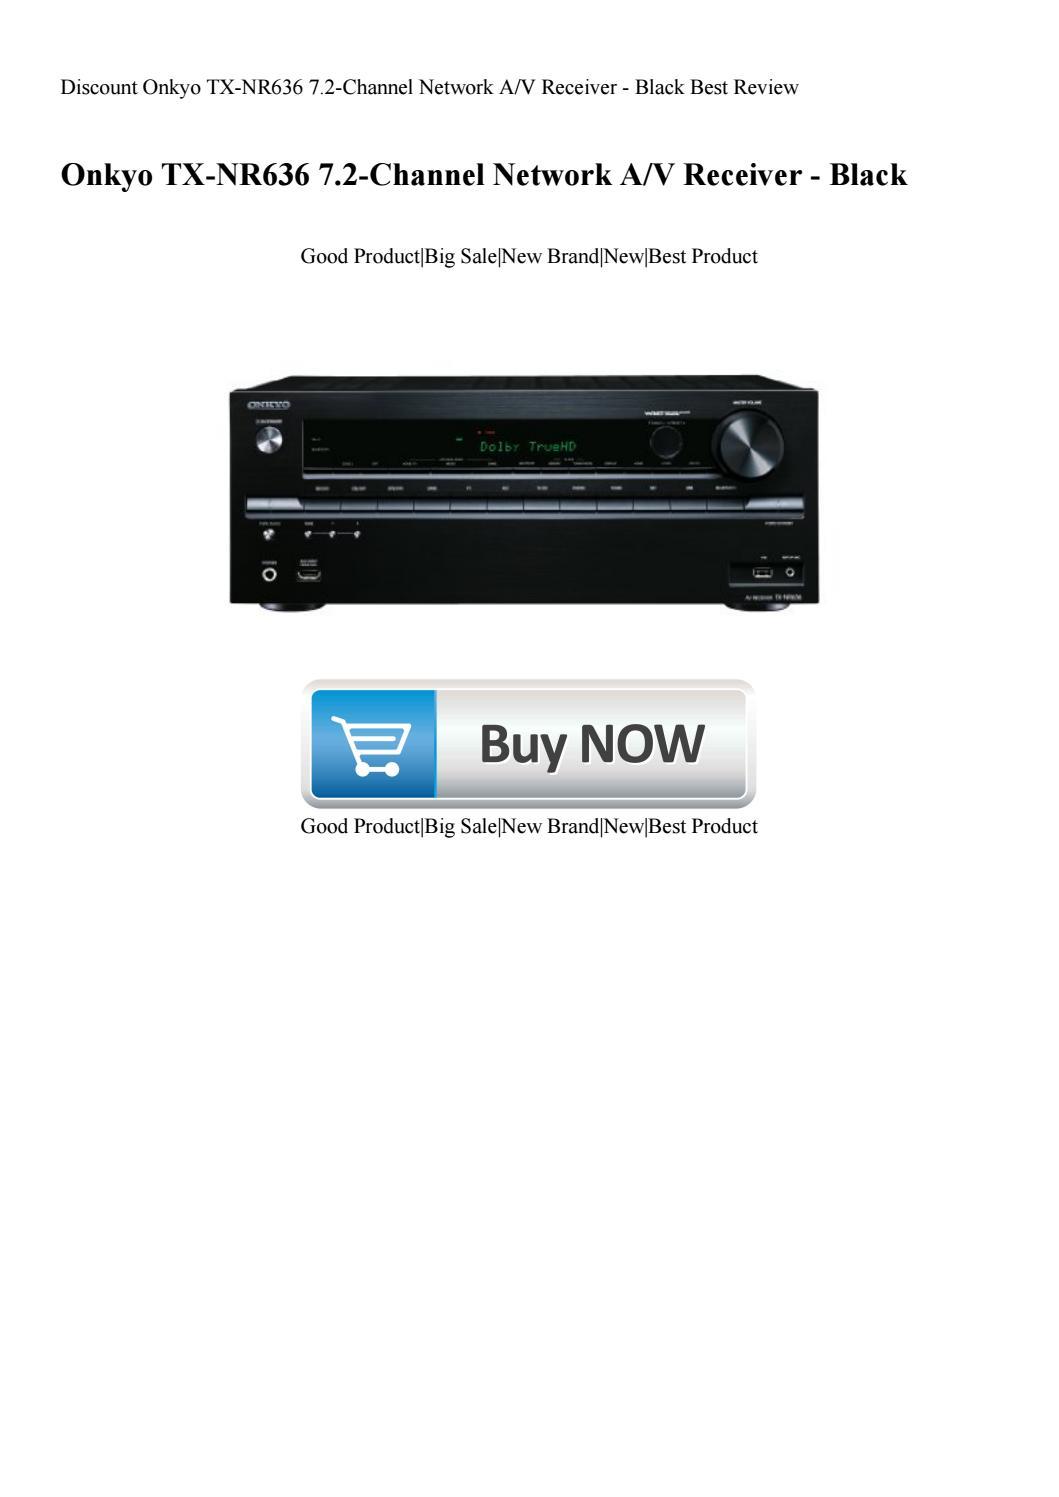 Discount Onkyo TX-NR636 7 2-Channel Network AV Receiver - Black Best